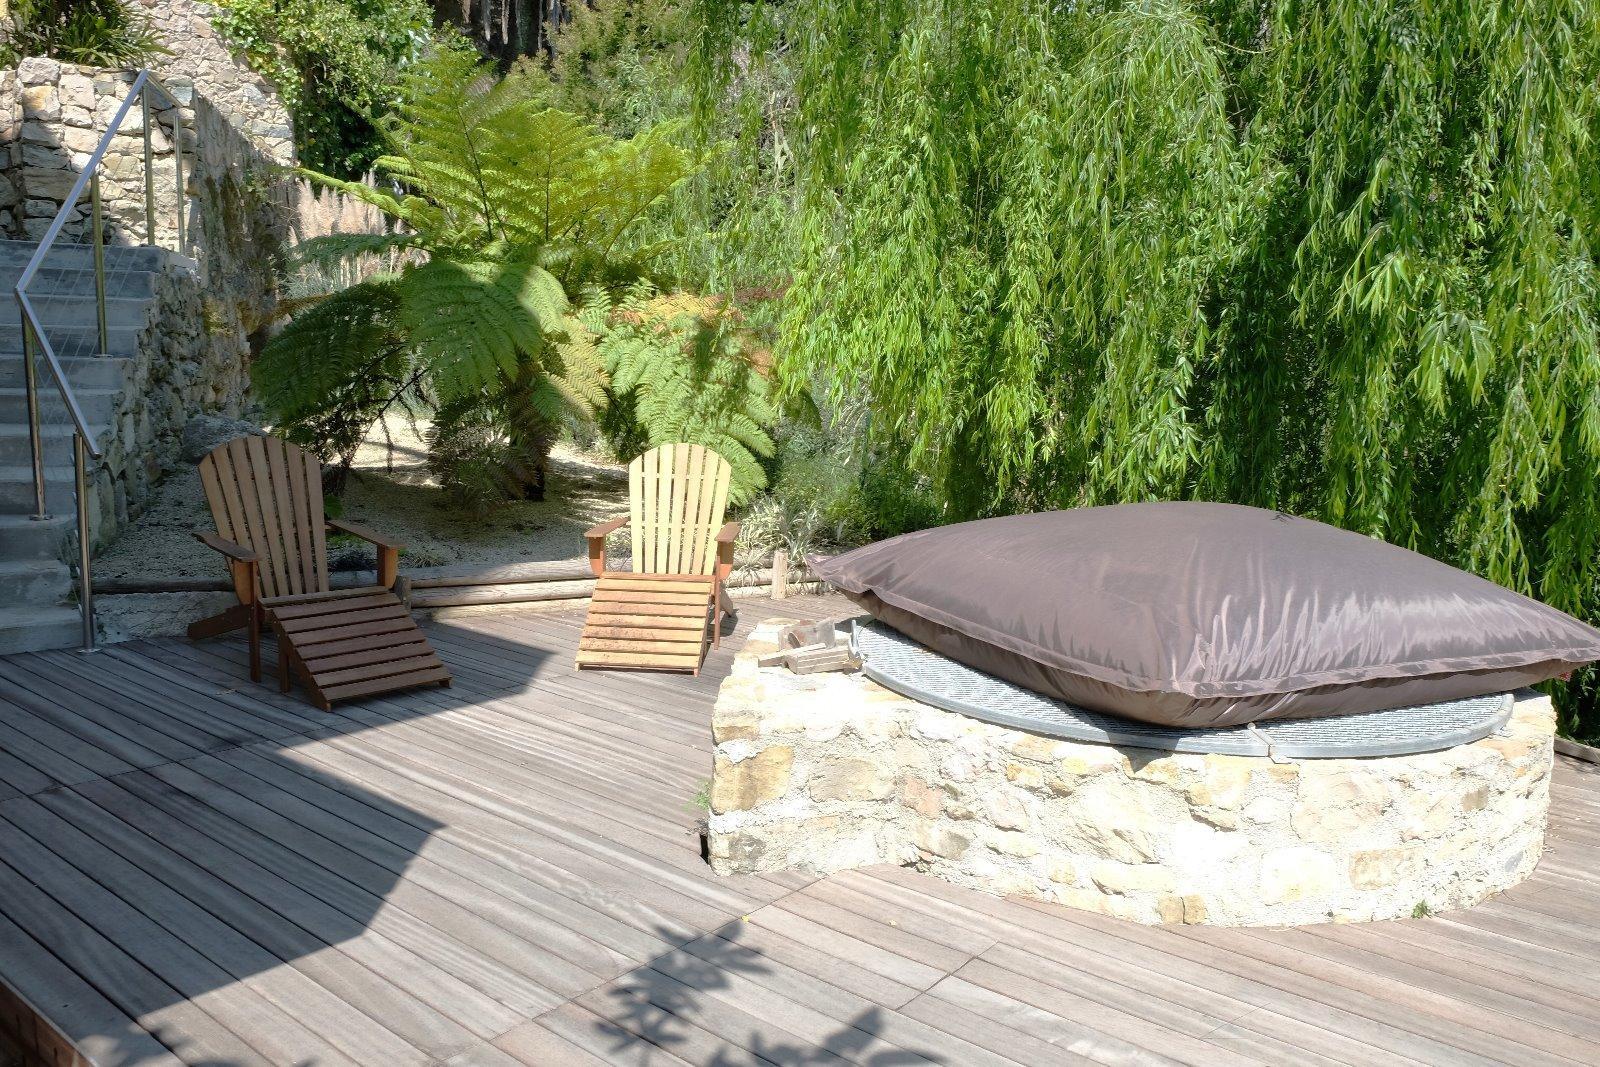 Vente menton garavan 4p 110m2 terrasse 60m2 jardin 140m2 for Jardin 60m2